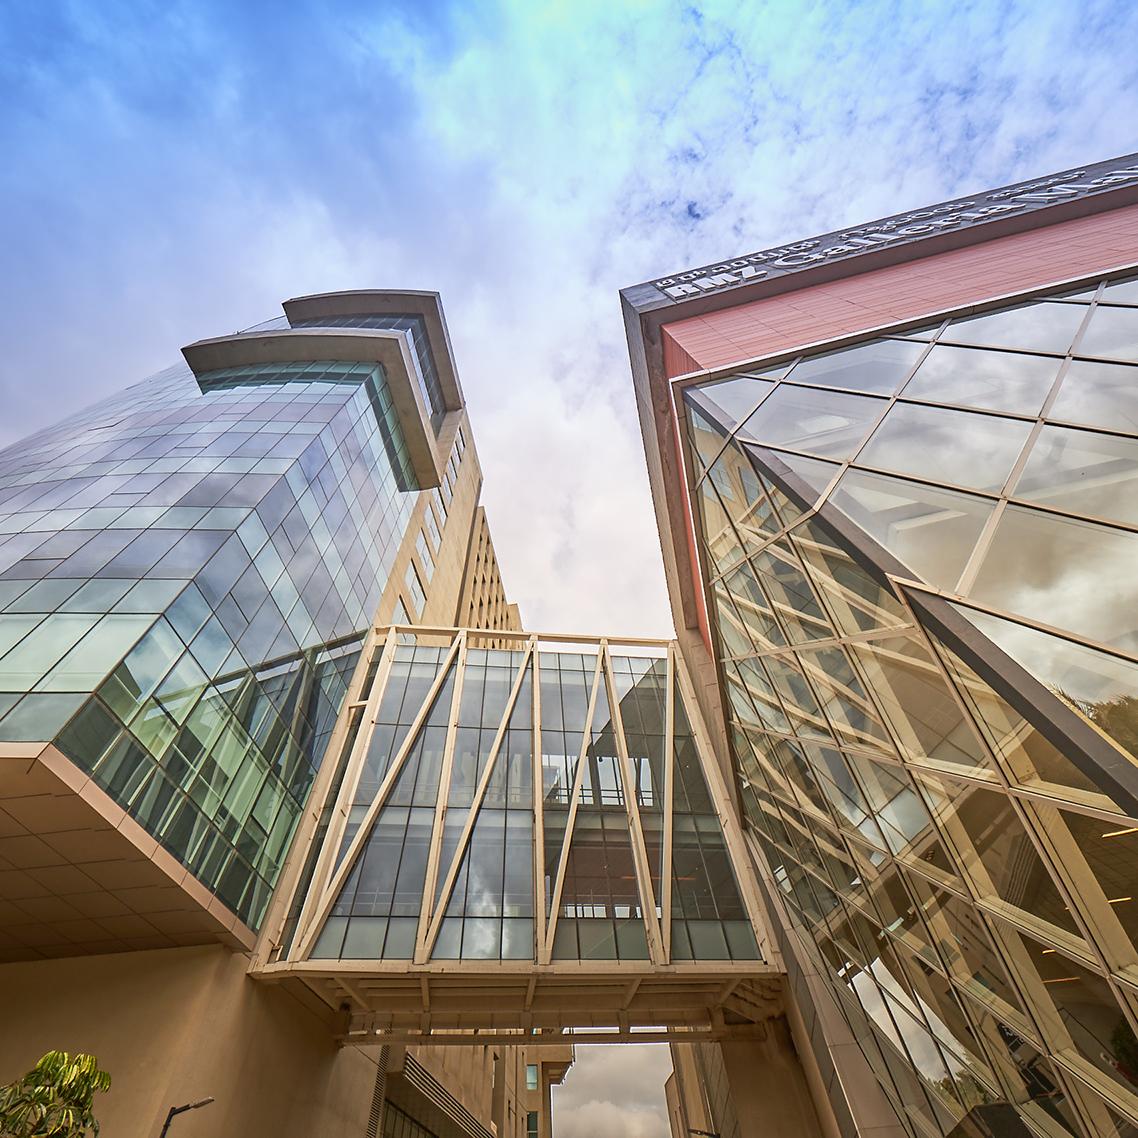 Detail shot of a mall's skybridge